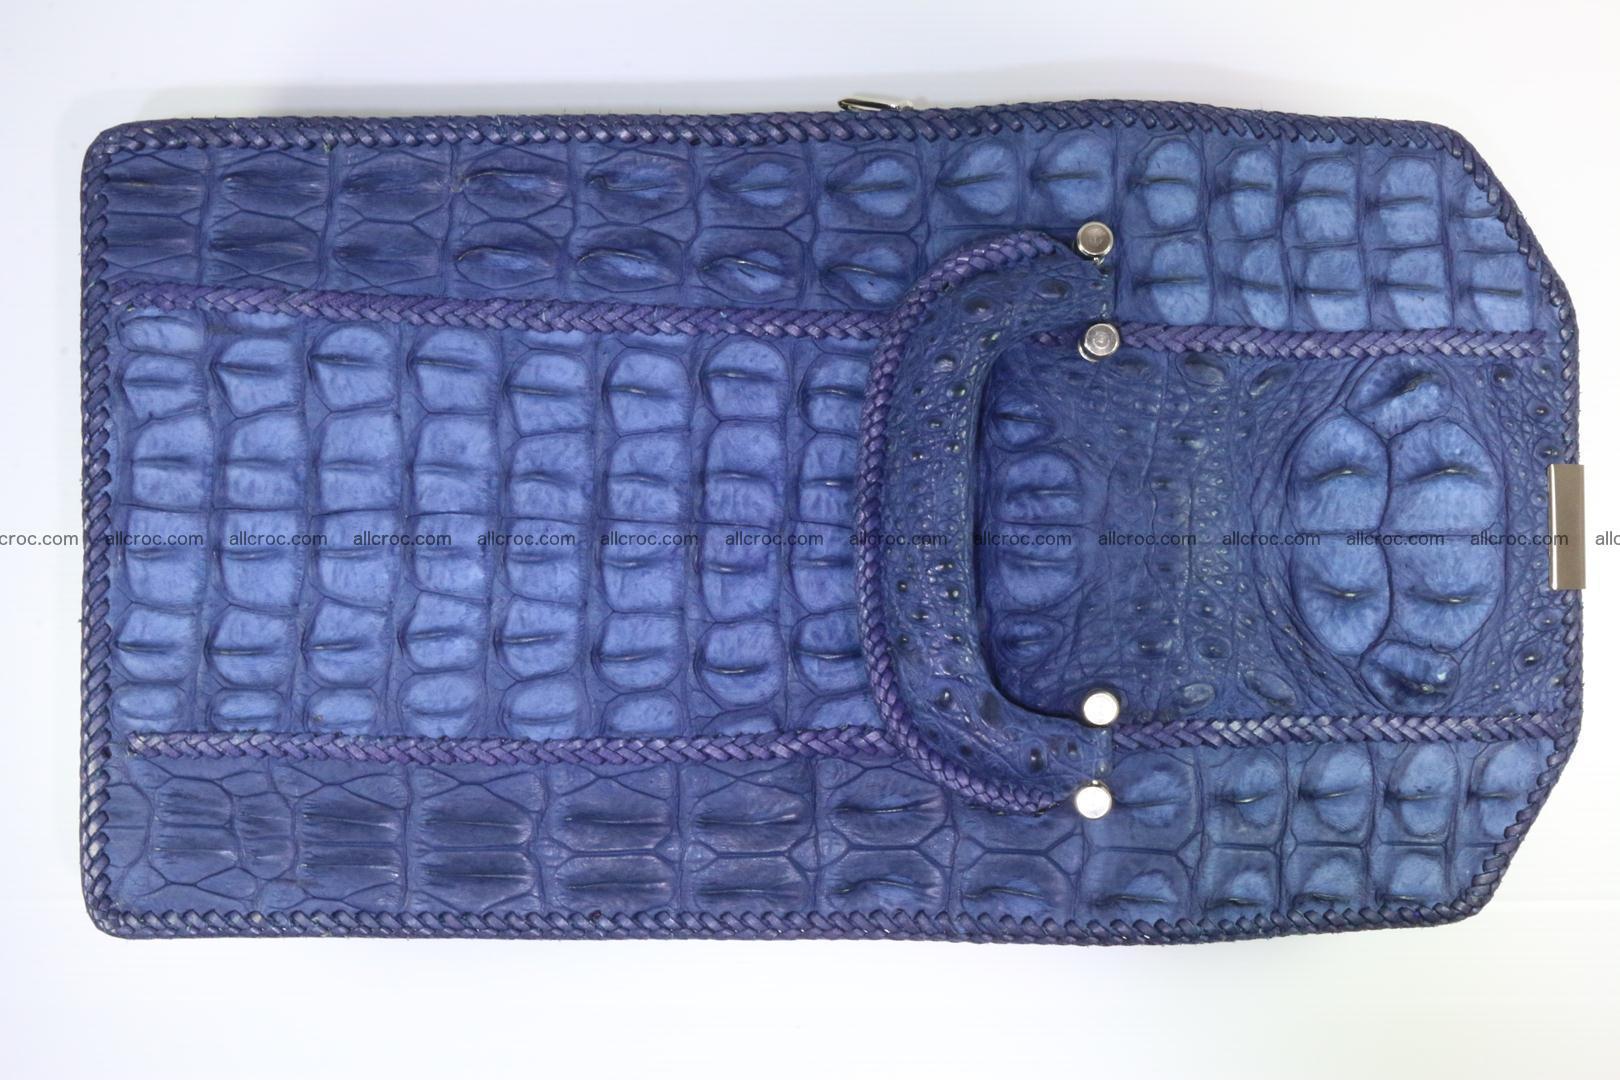 Crocodile skin messenger bag braided edges 422 Foto 13